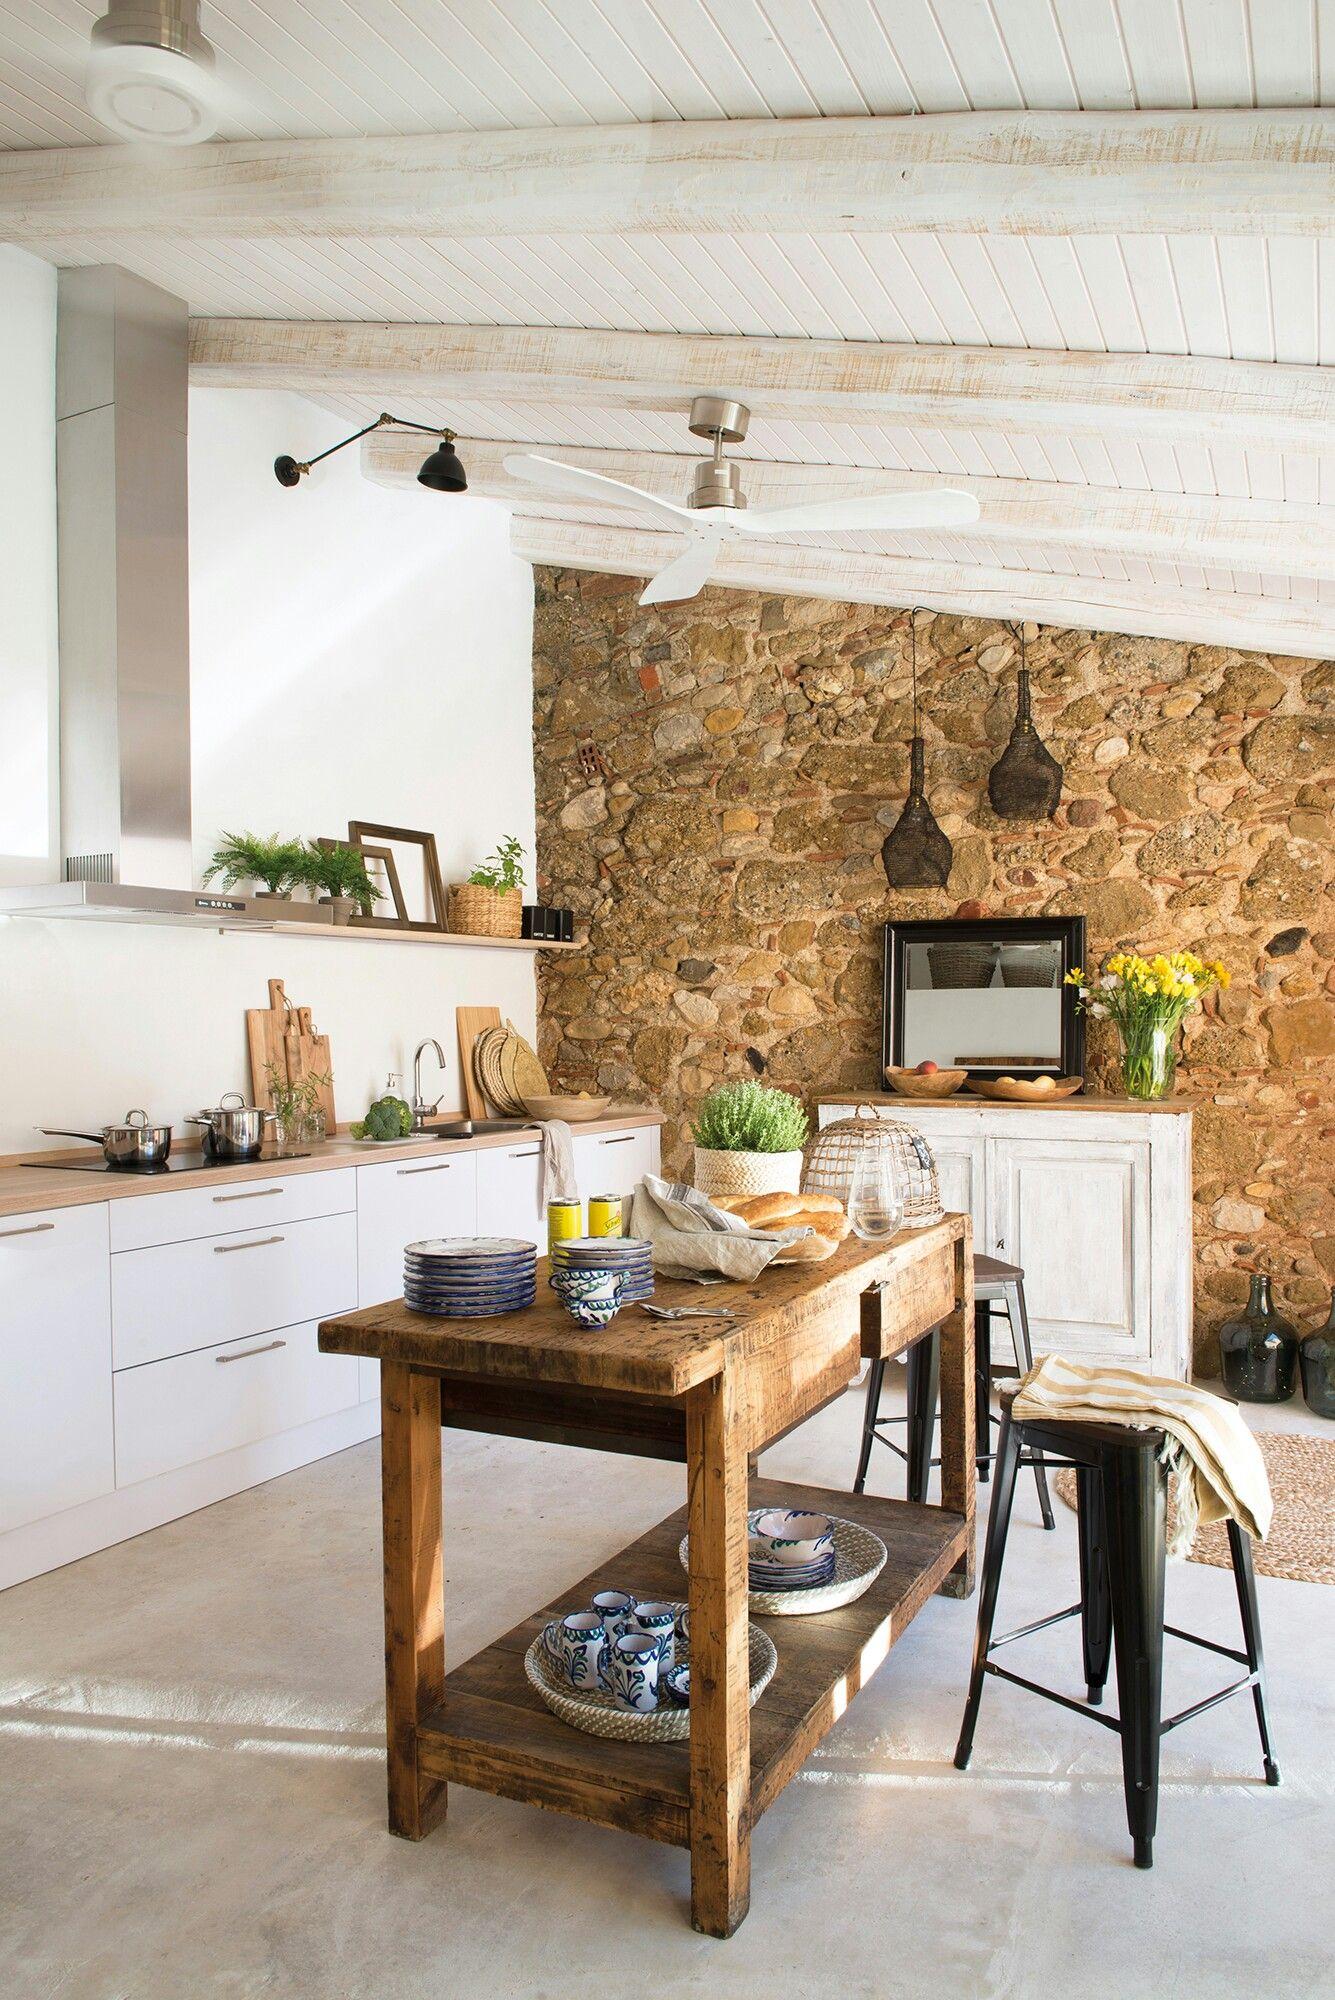 Excelente Granito Isla De Cocina Con Asientos Colección - Como ...